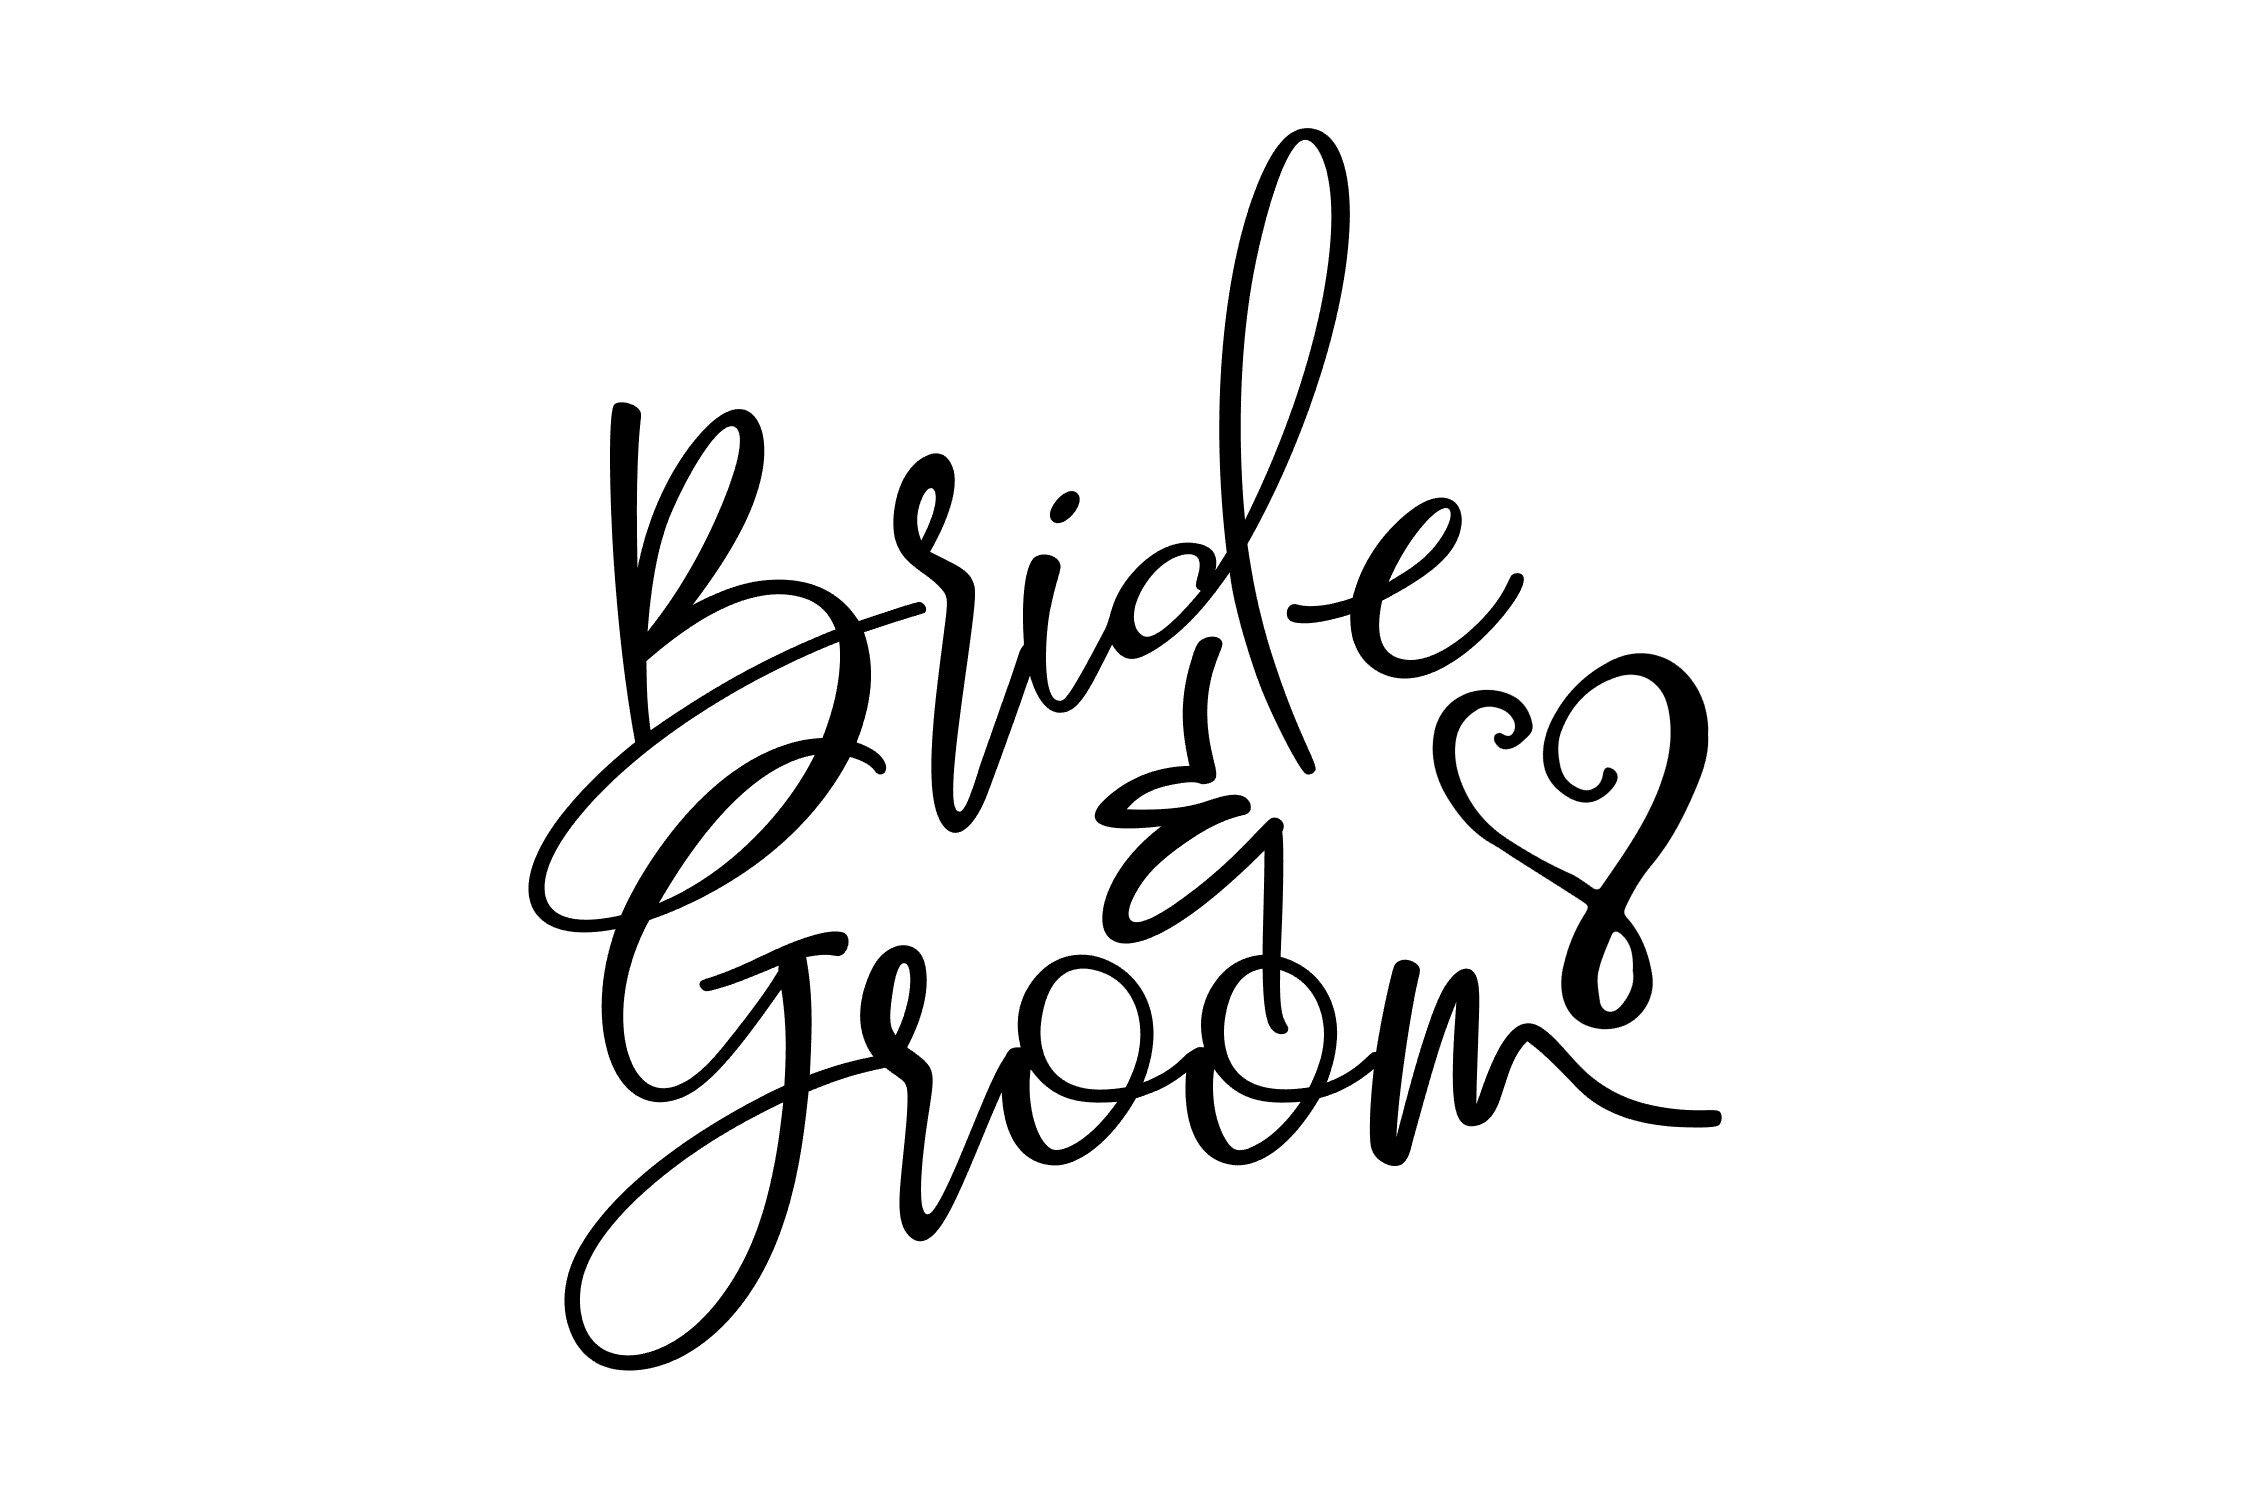 Bride Groom Svg Png Eps By Studio 26 Design Co Thehungryjpeg Com